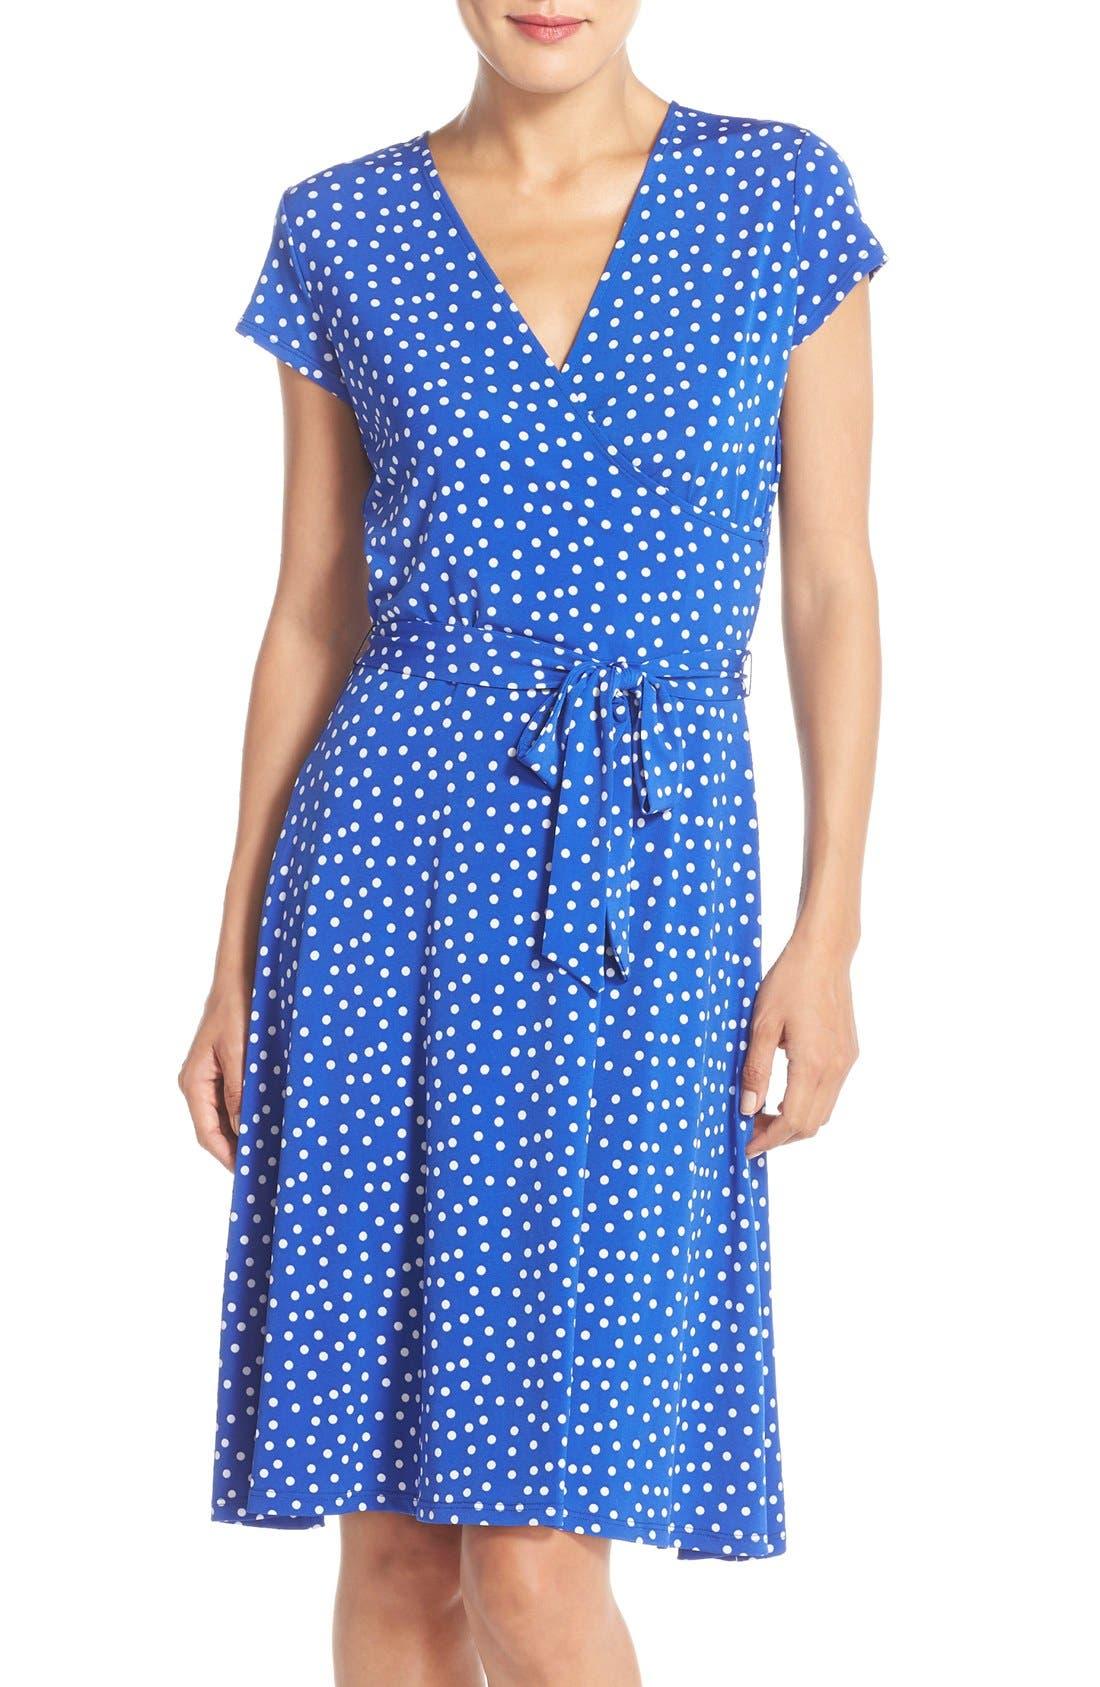 Main Image - Leota 'Perfect' Faux Wrap Polka Dot Jersey Dress